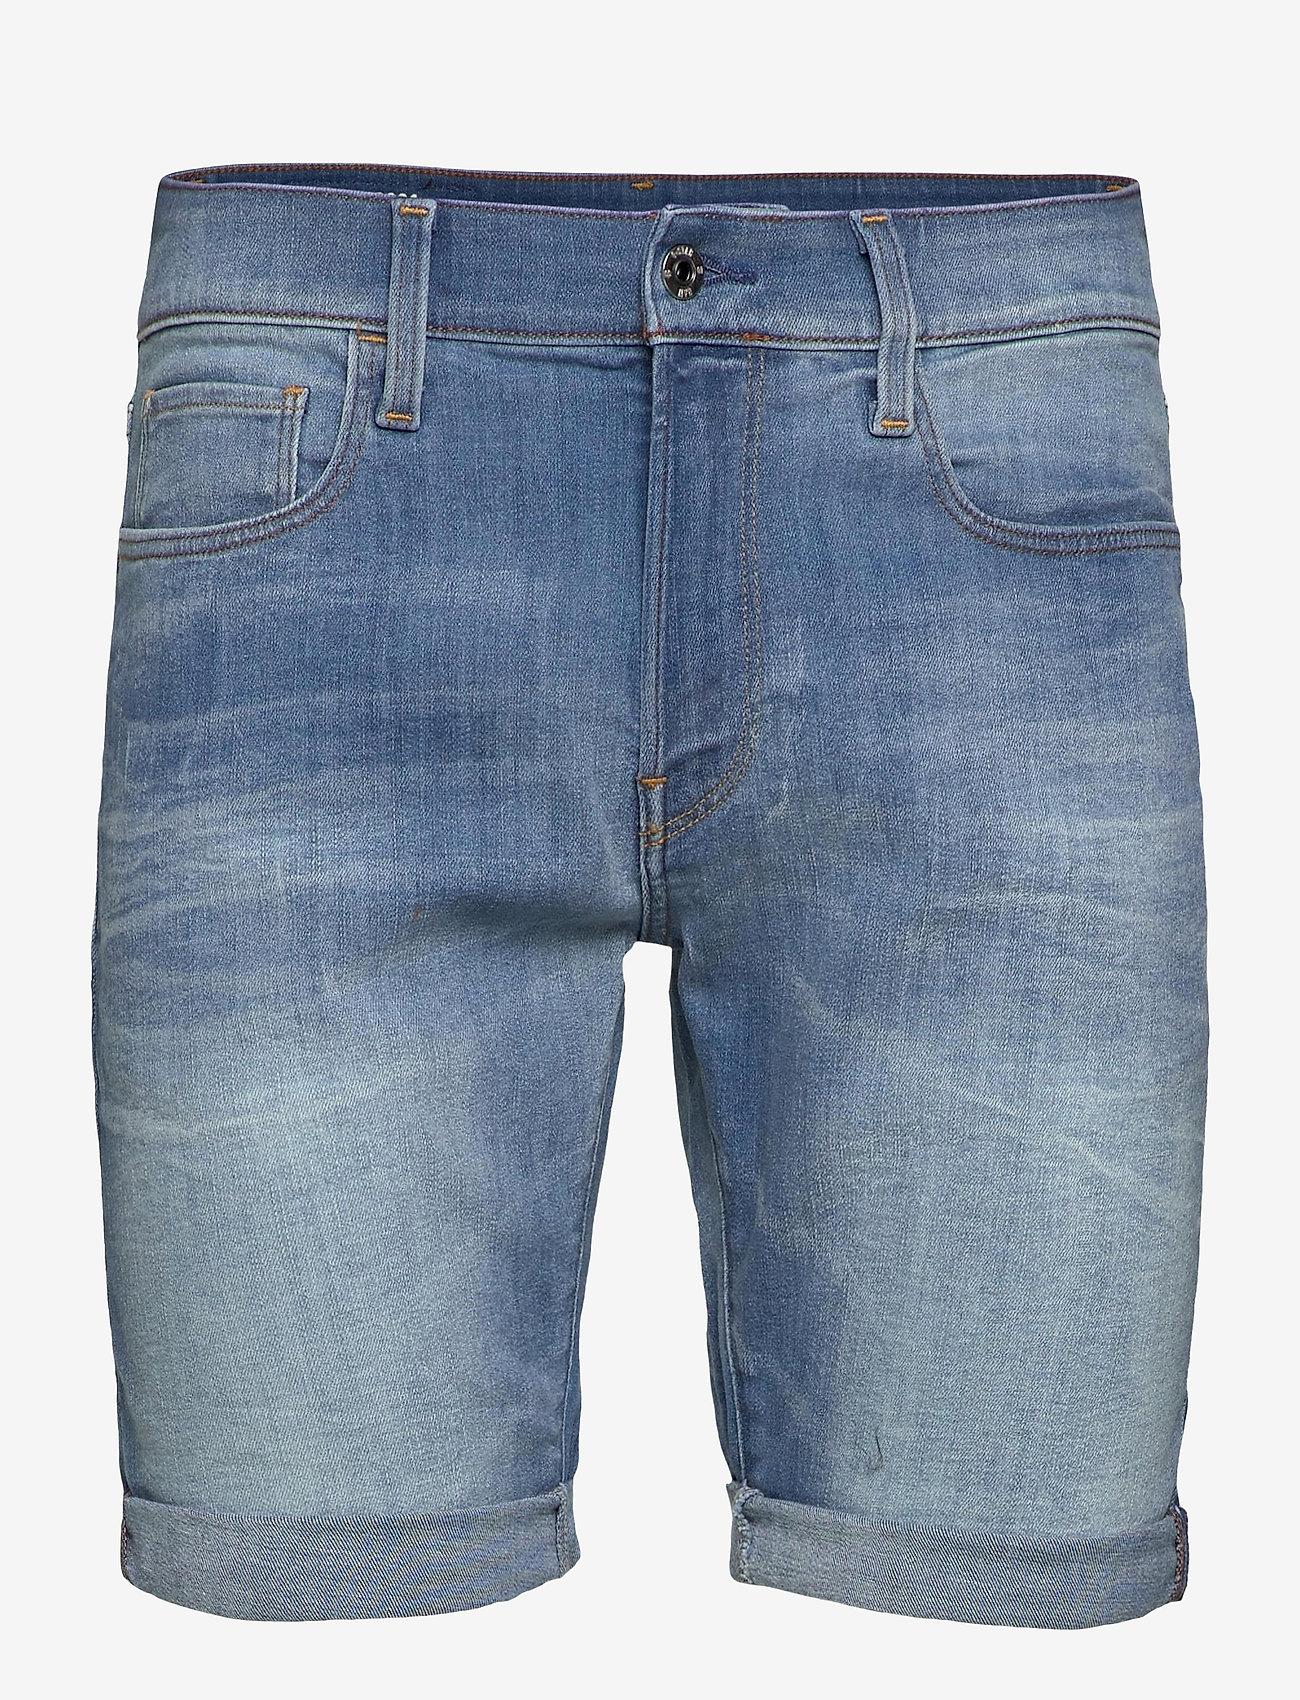 G-star RAW - 3301 Slim short - denim shorts - vintage striking blue - 0